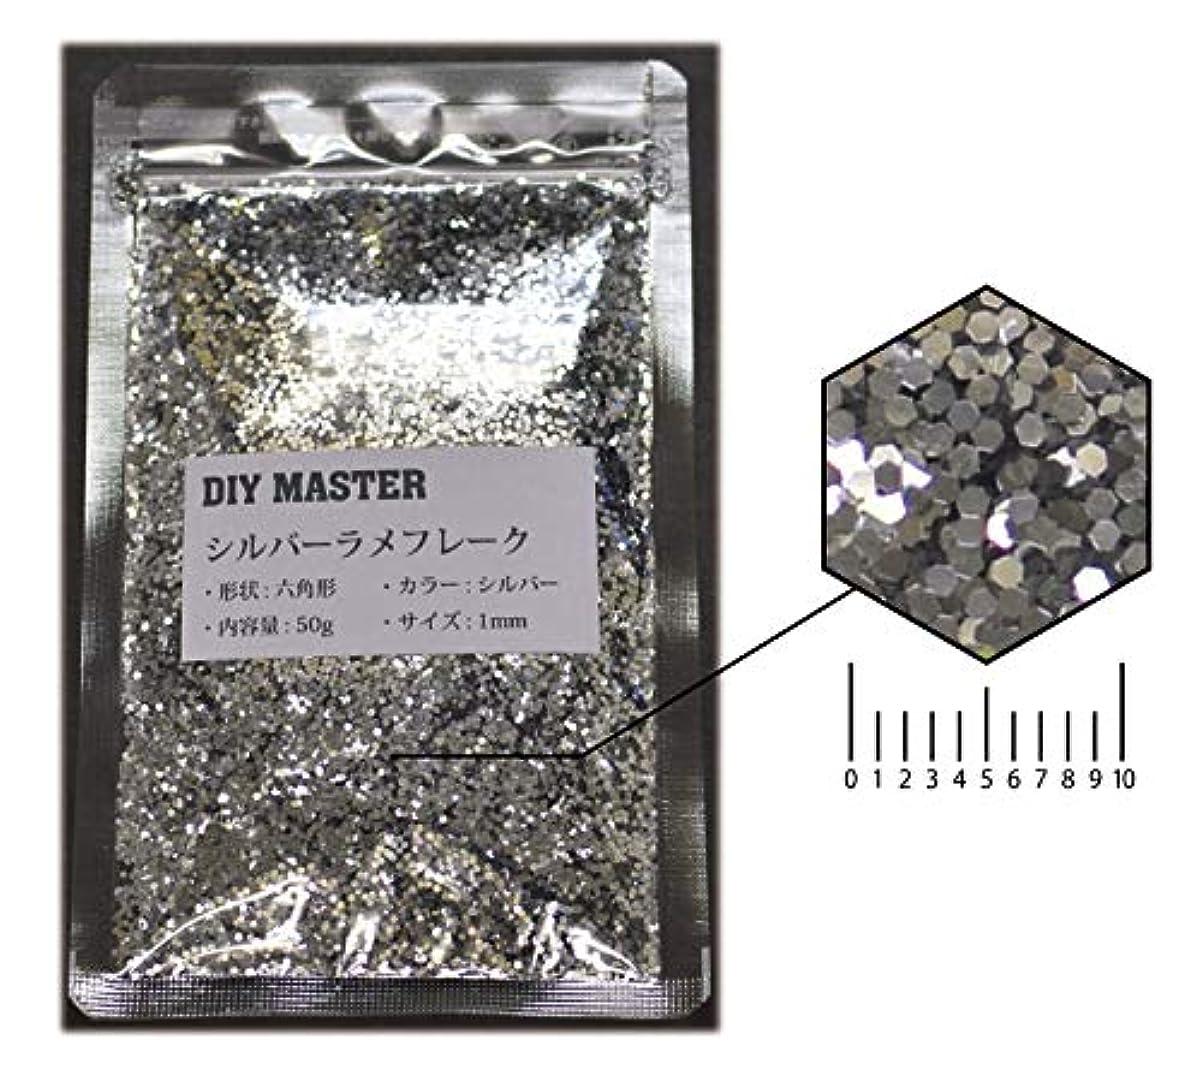 DIY MASTER シルバー ラメフレーク 1mm 50g